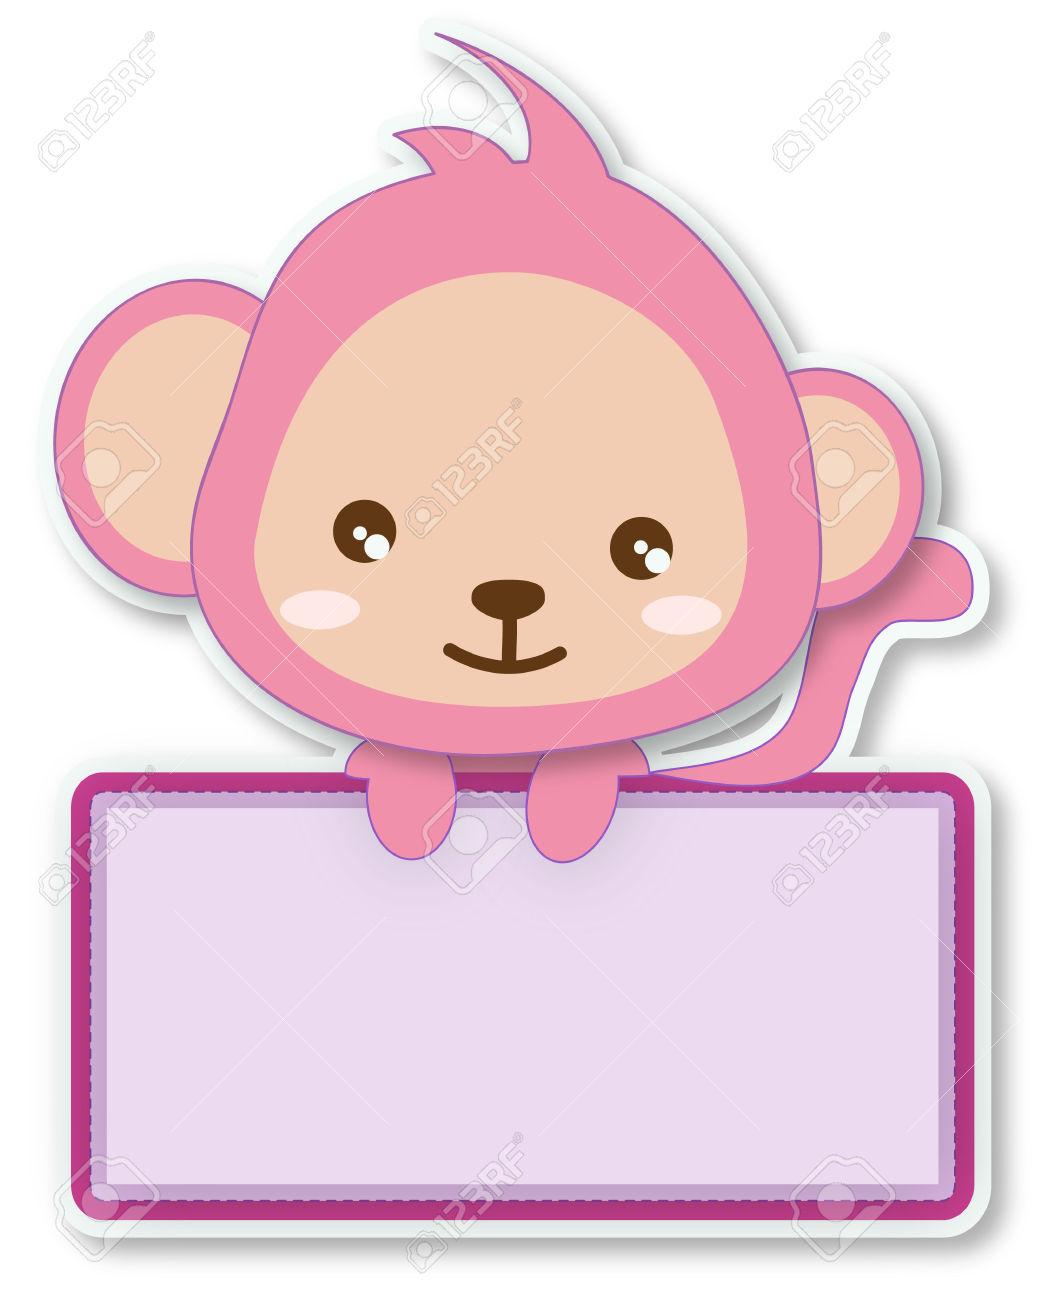 Cute Cartoon Monkey Pics Group (87+)